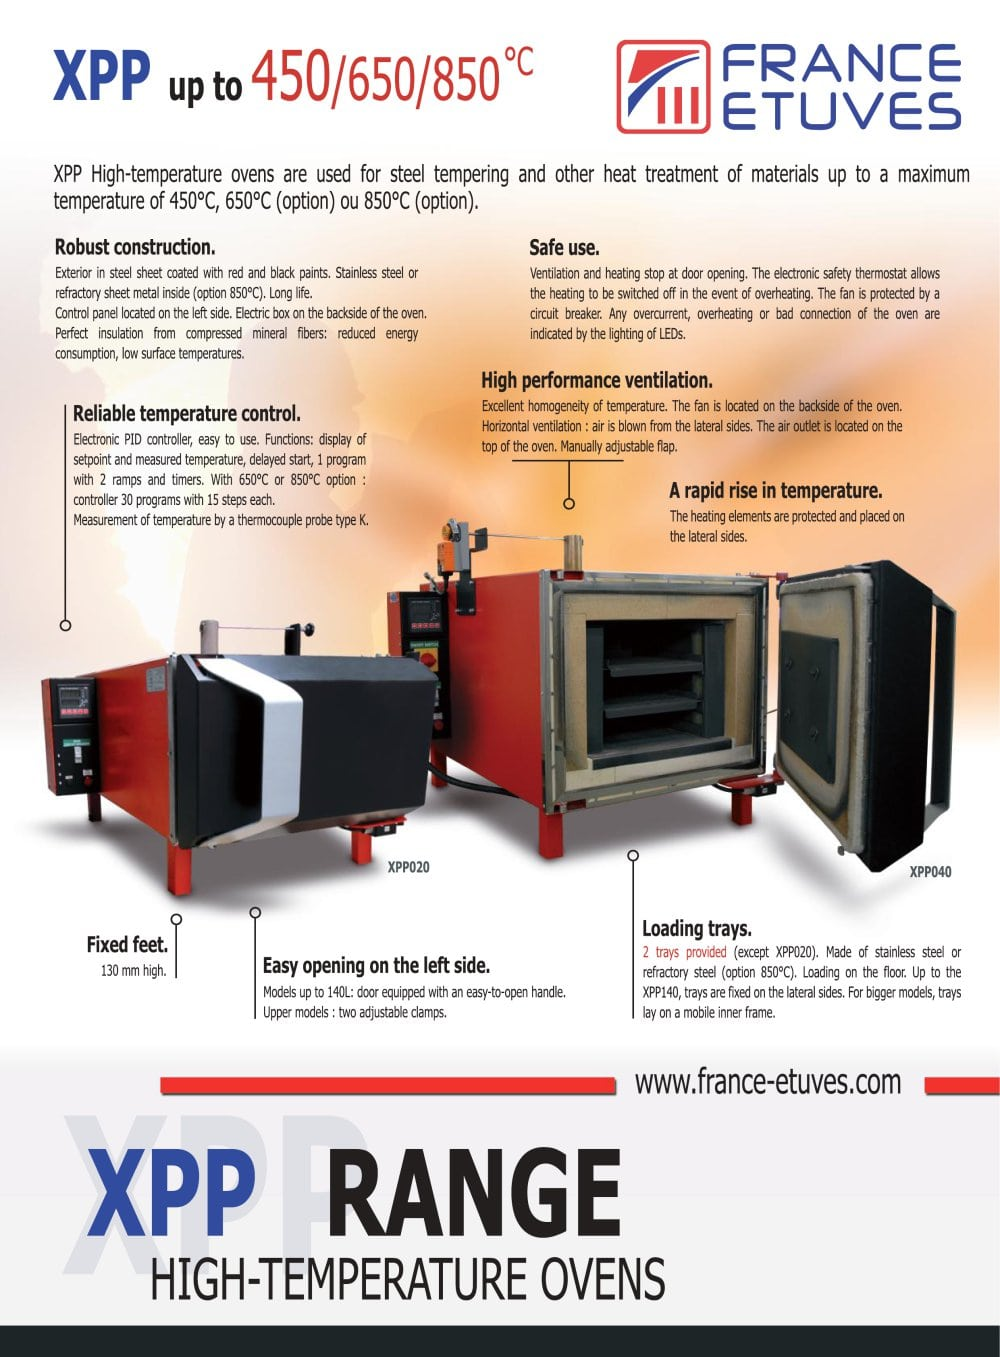 Xpp France Etuves Pdf Catalogue Technical Documentation Brochure Bad Circuit Breaker 1 2 Pages